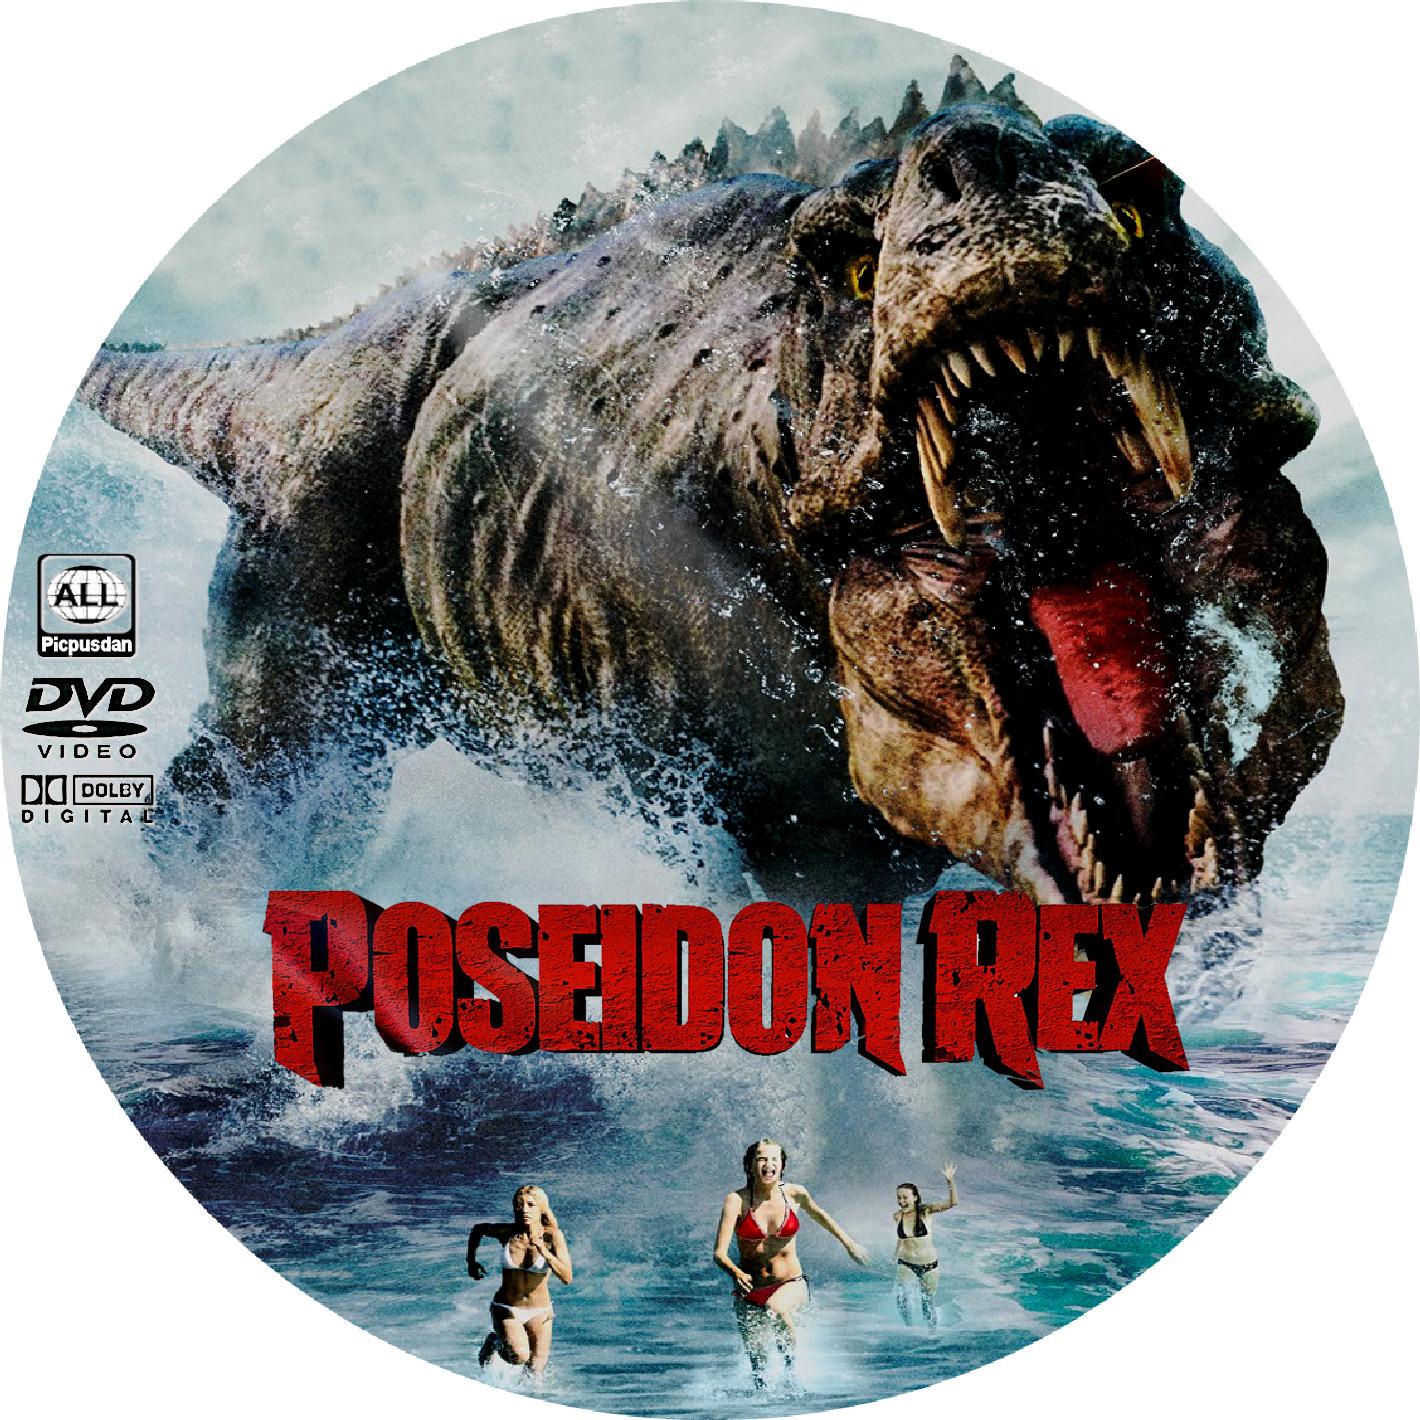 poseidon rex movie download in hindi 720p